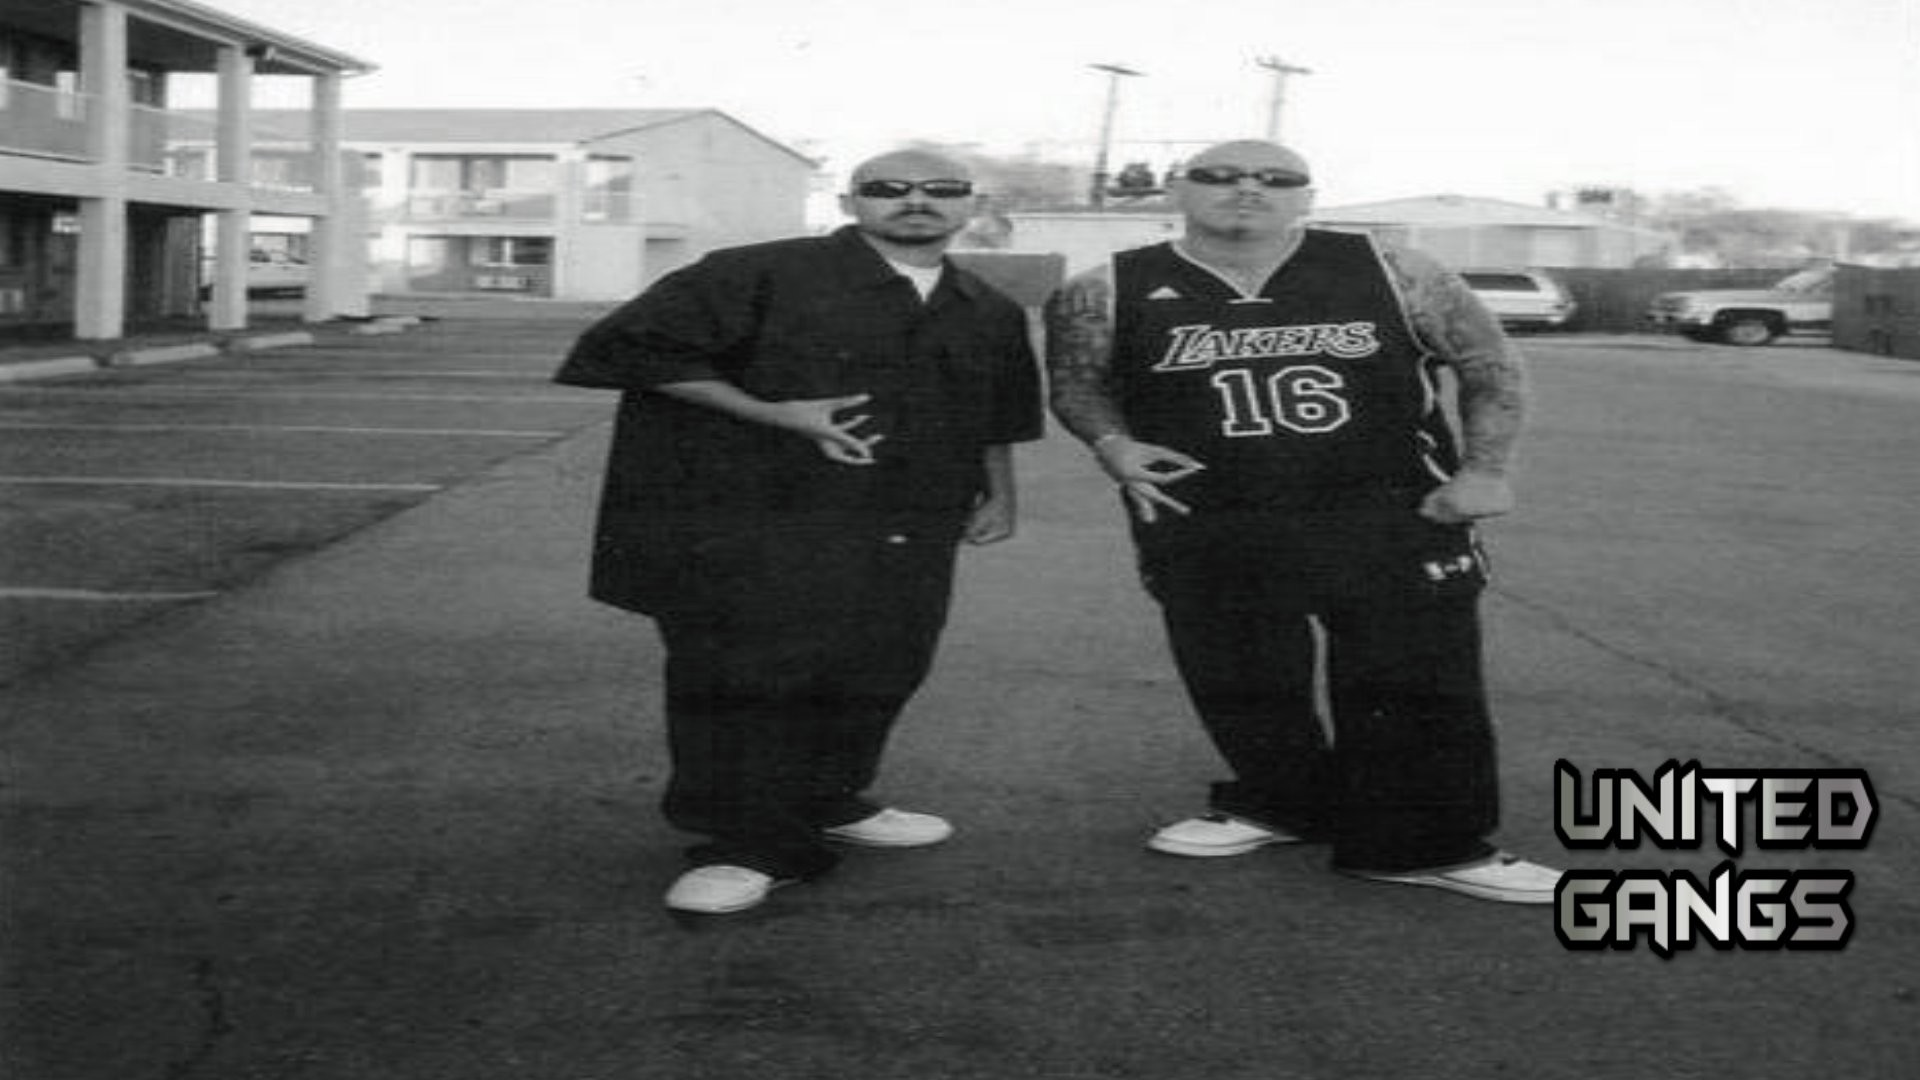 Crips Gang Wallpaper (59+ images)